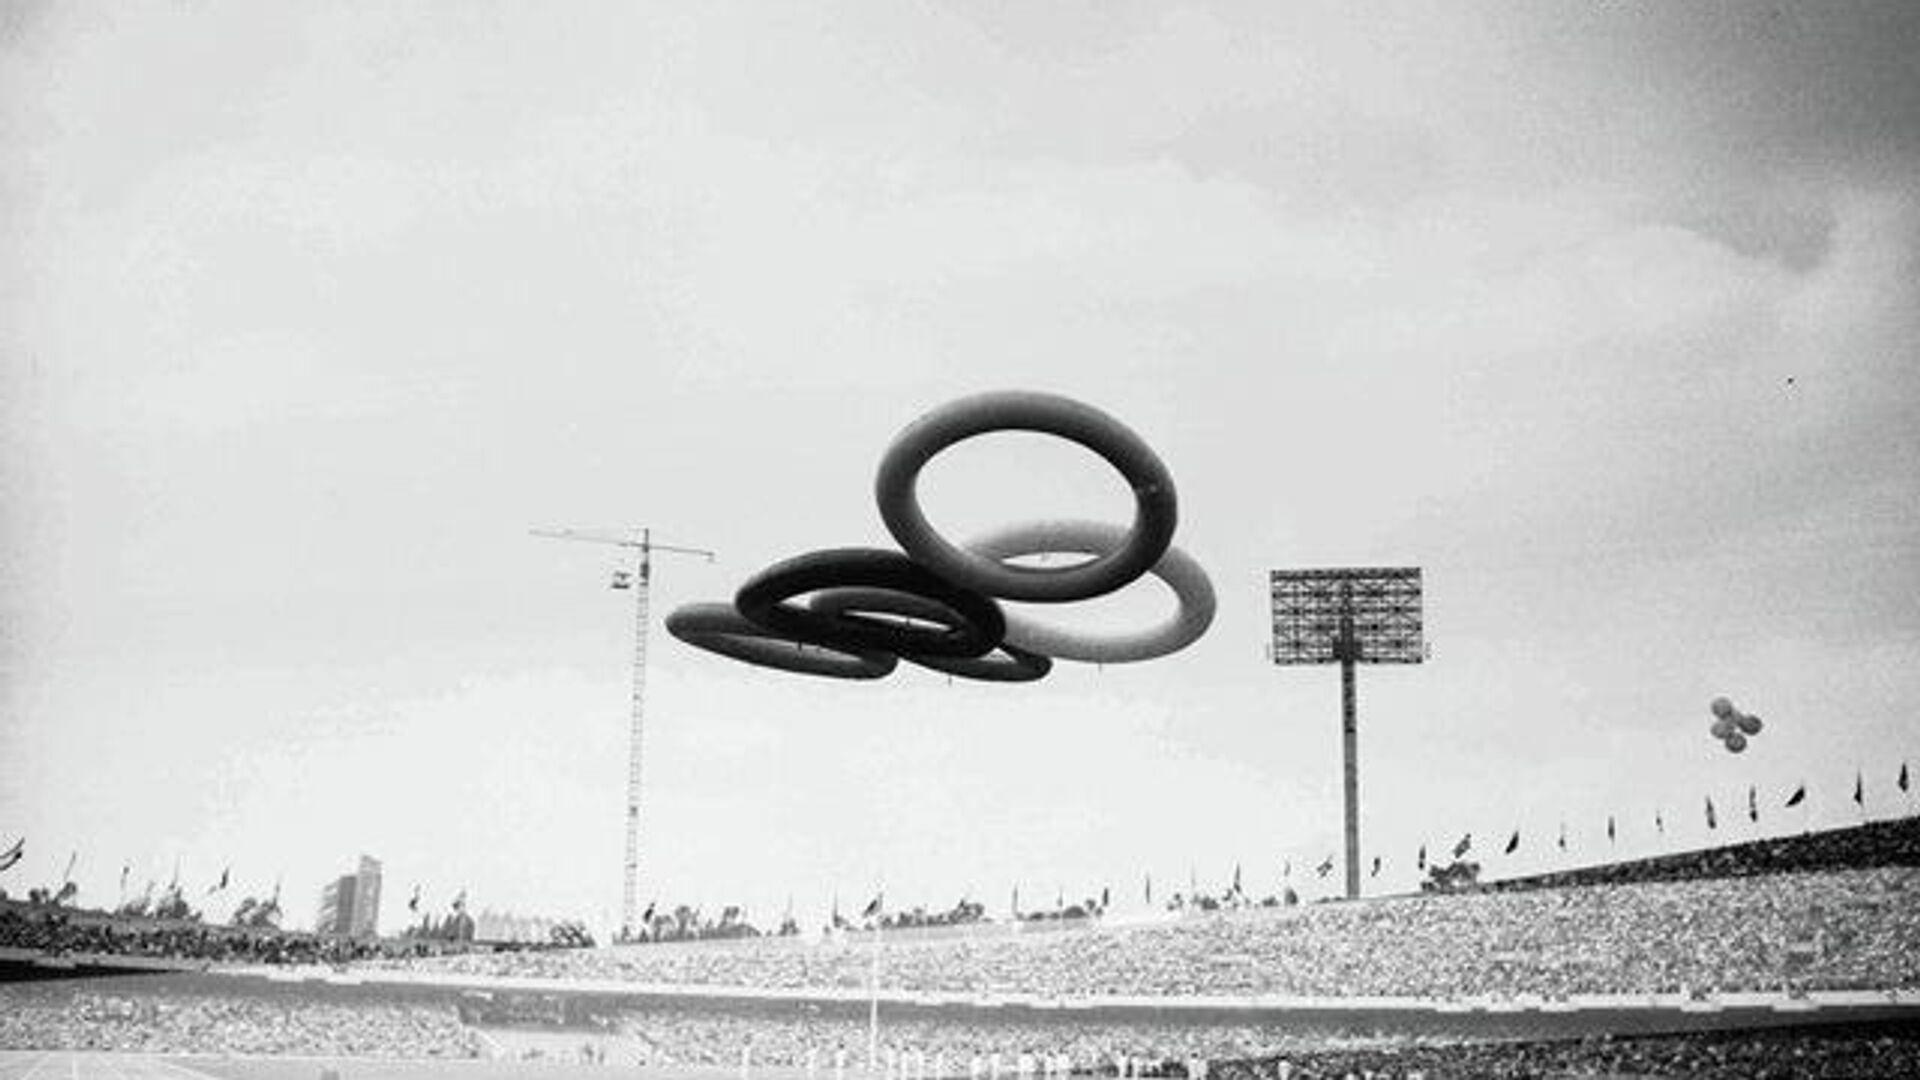 Olimpiadas de México 68 - Sputnik Mundo, 1920, 12.10.2021